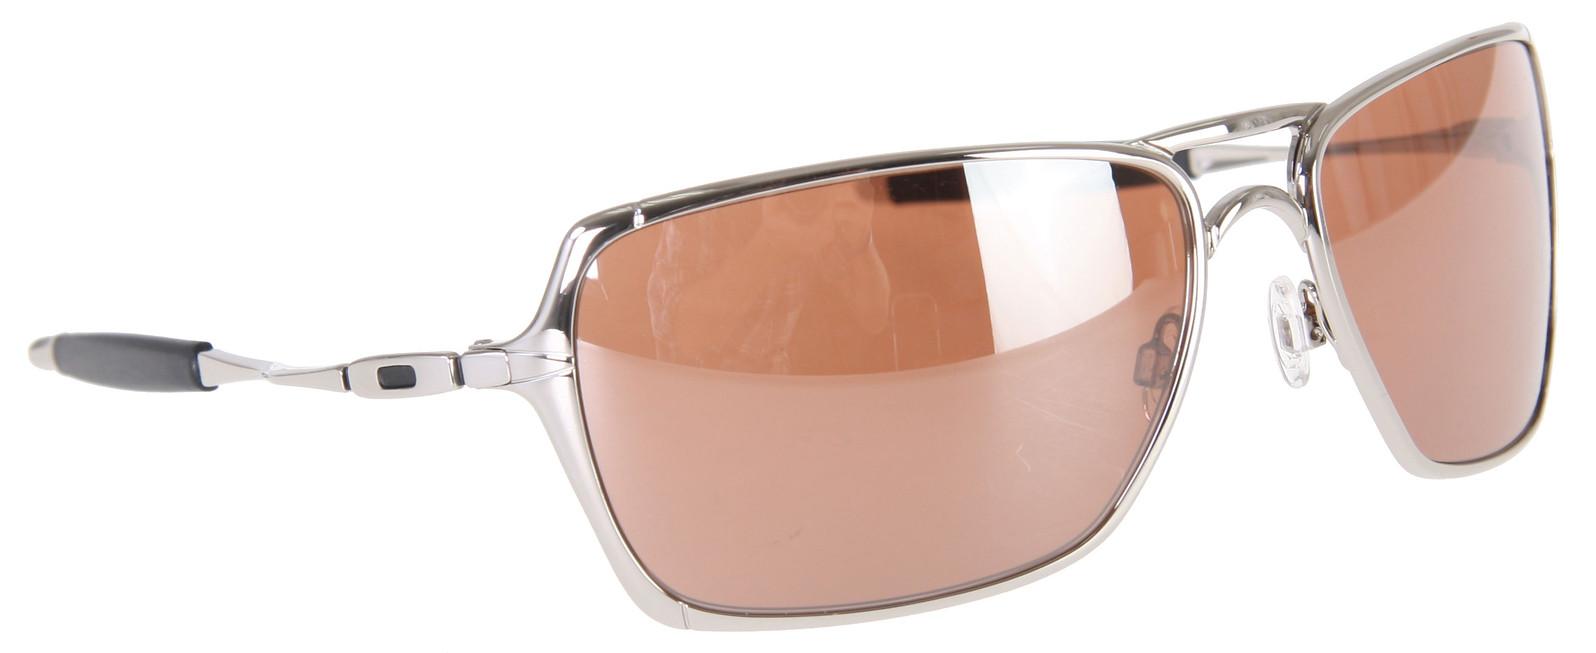 oakley inmate  Oakley Inmate Sunglasses Polished Chrome/Vr28 Black Iridium Lens ...